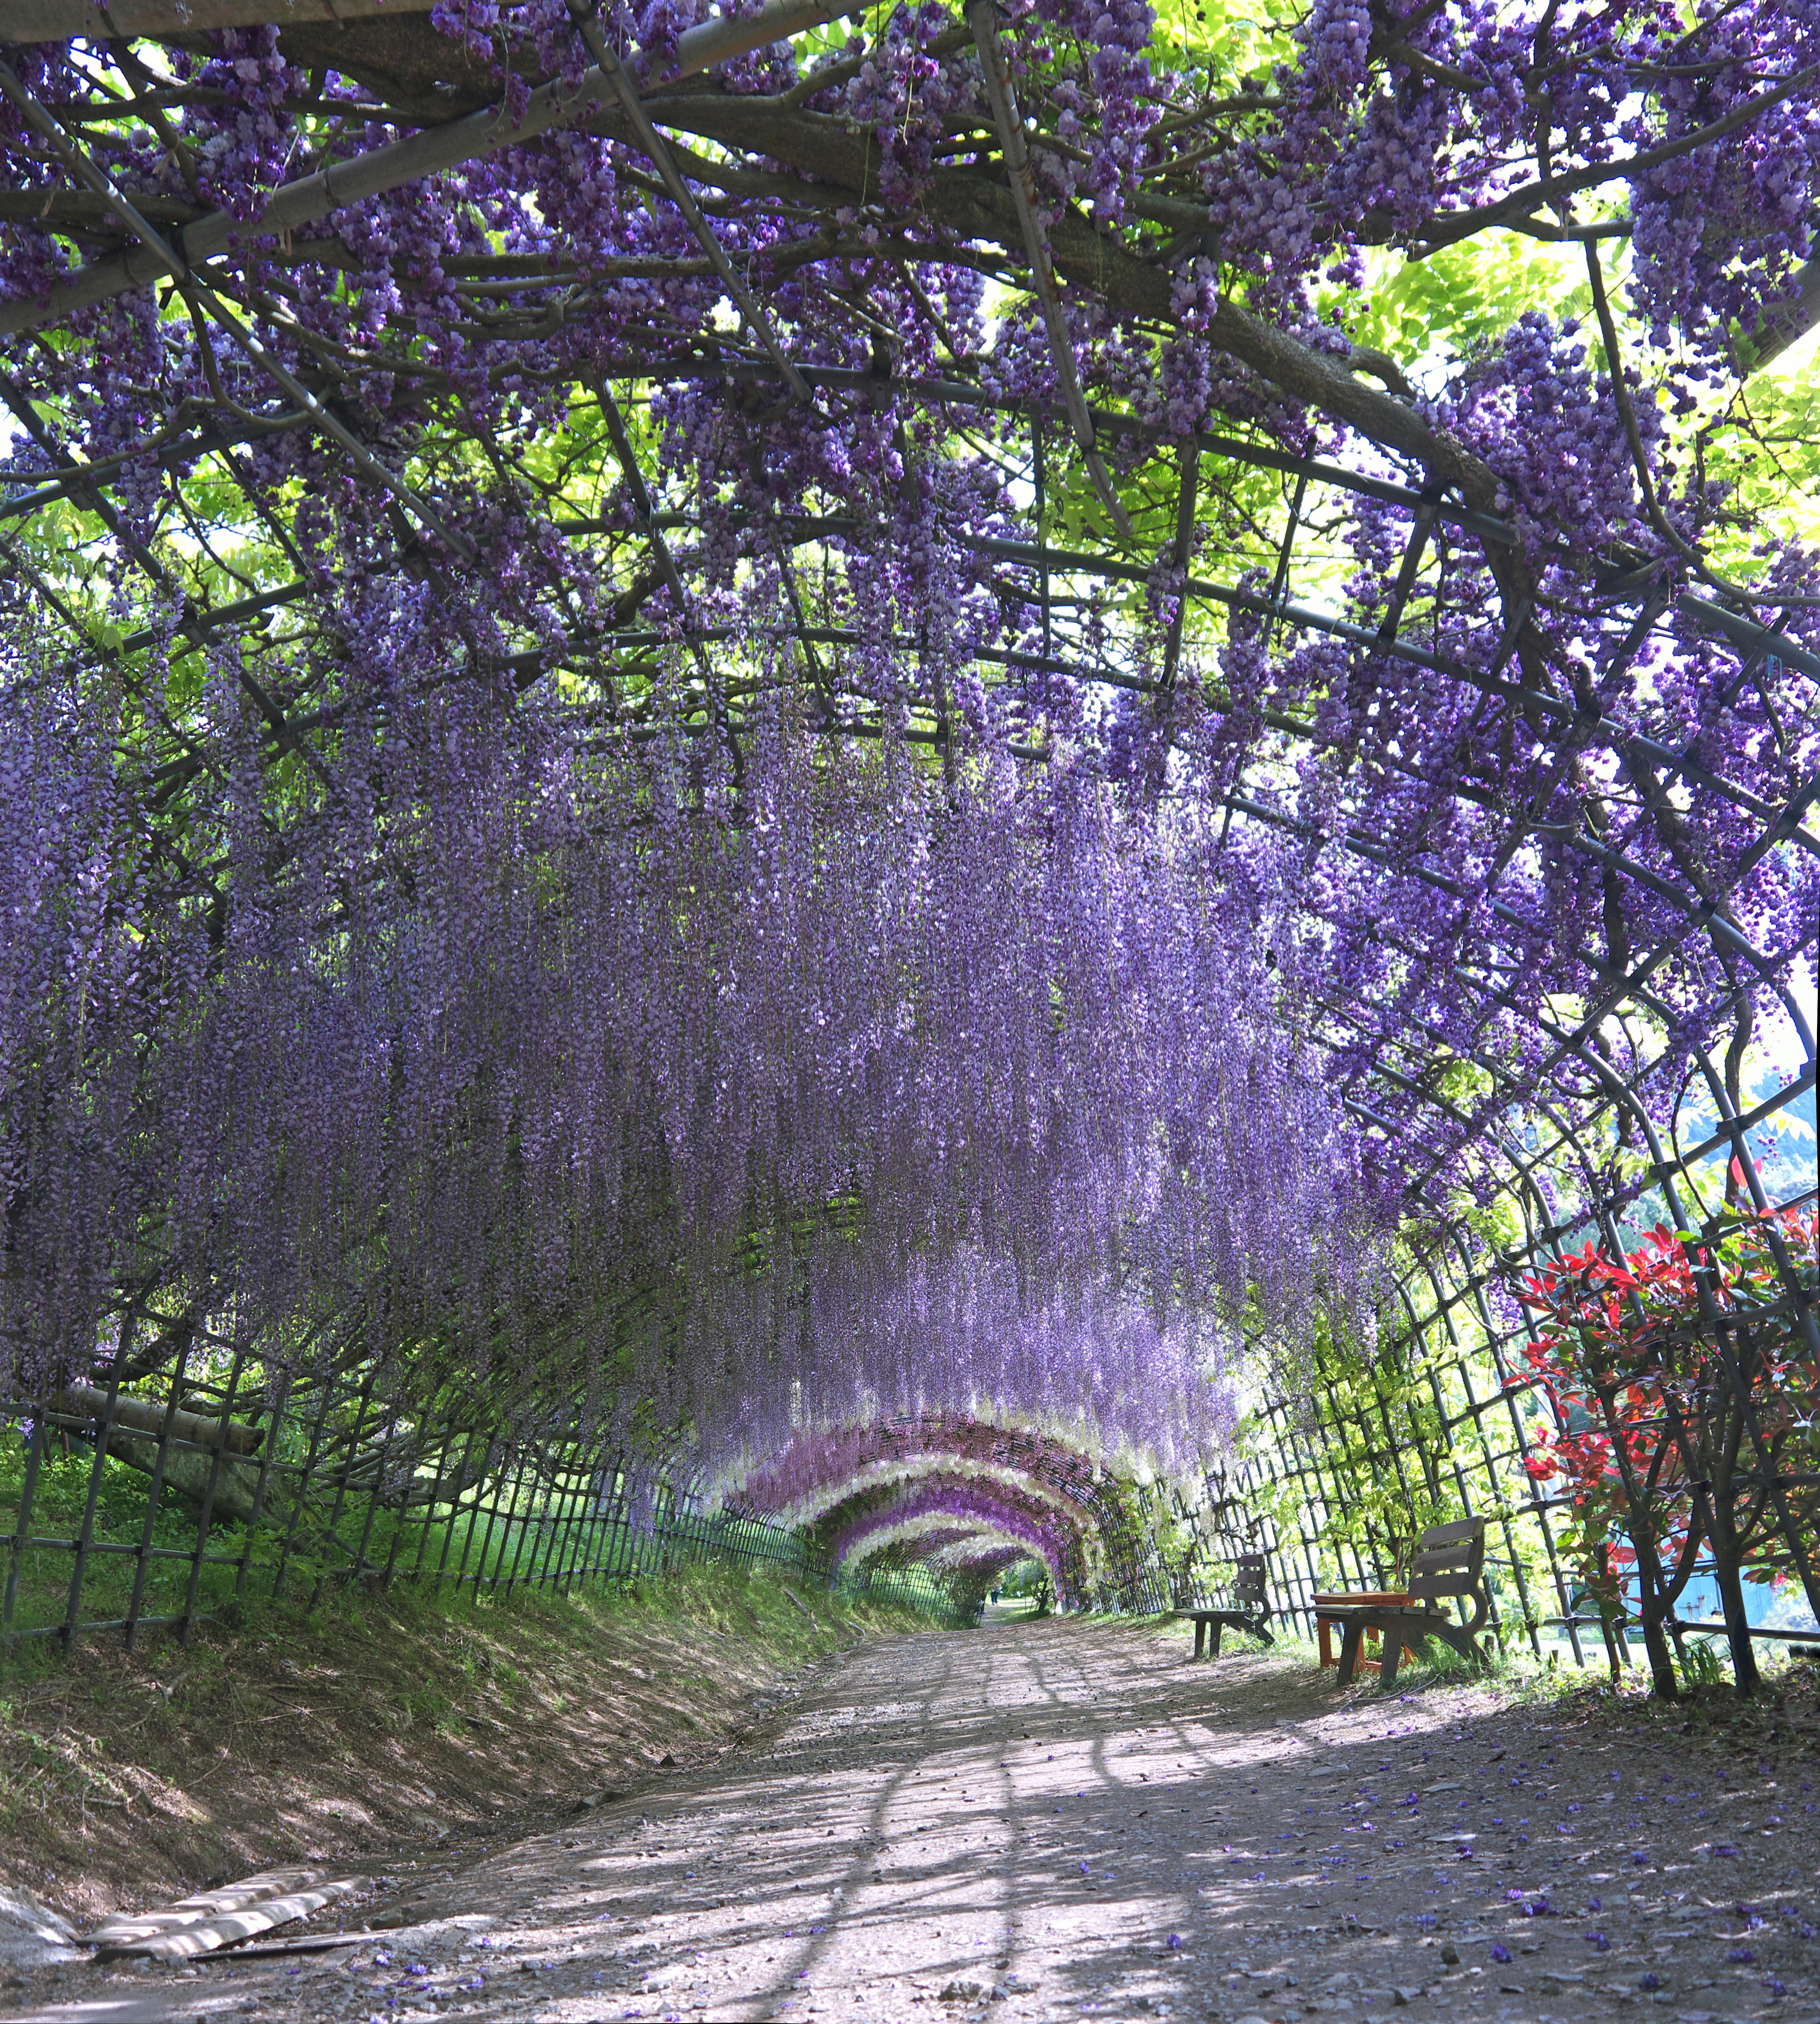 Wisteria tunnel, purple flowers, japanese garden, Kyushu, Japan